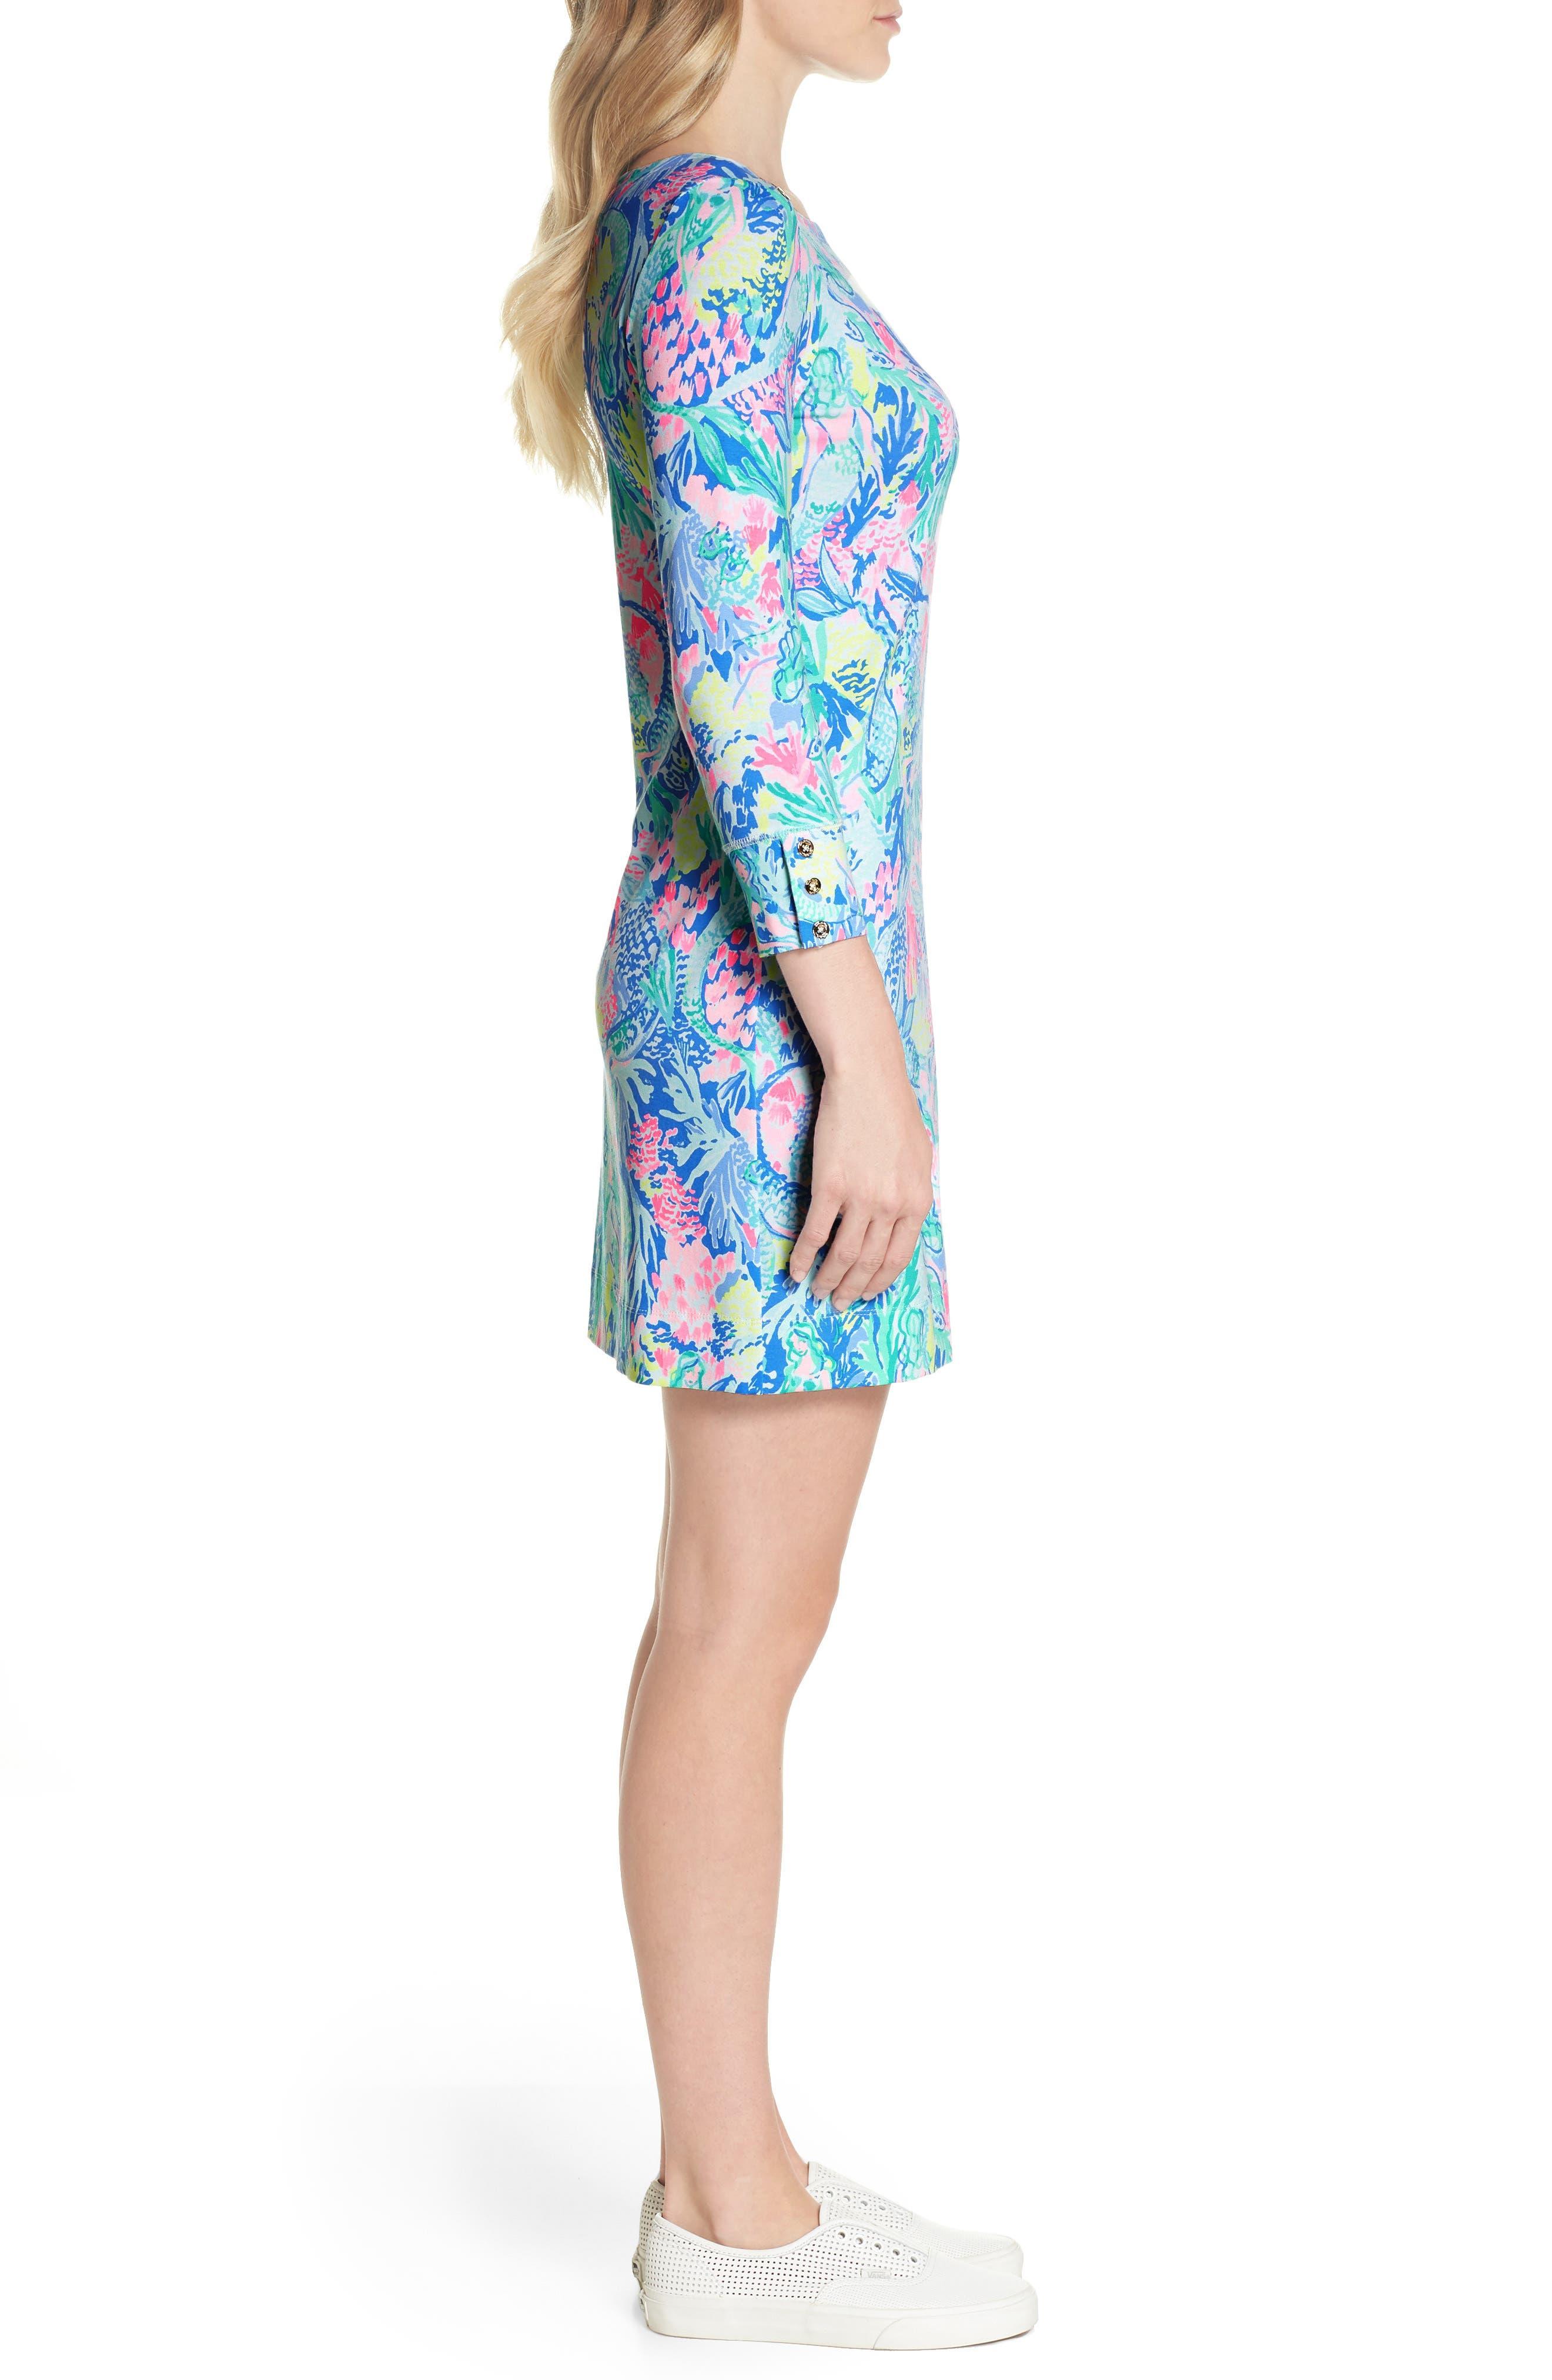 Sophie UPF 50+ Shift Dress,                             Alternate thumbnail 3, color,                             Multi Mermaids Cove